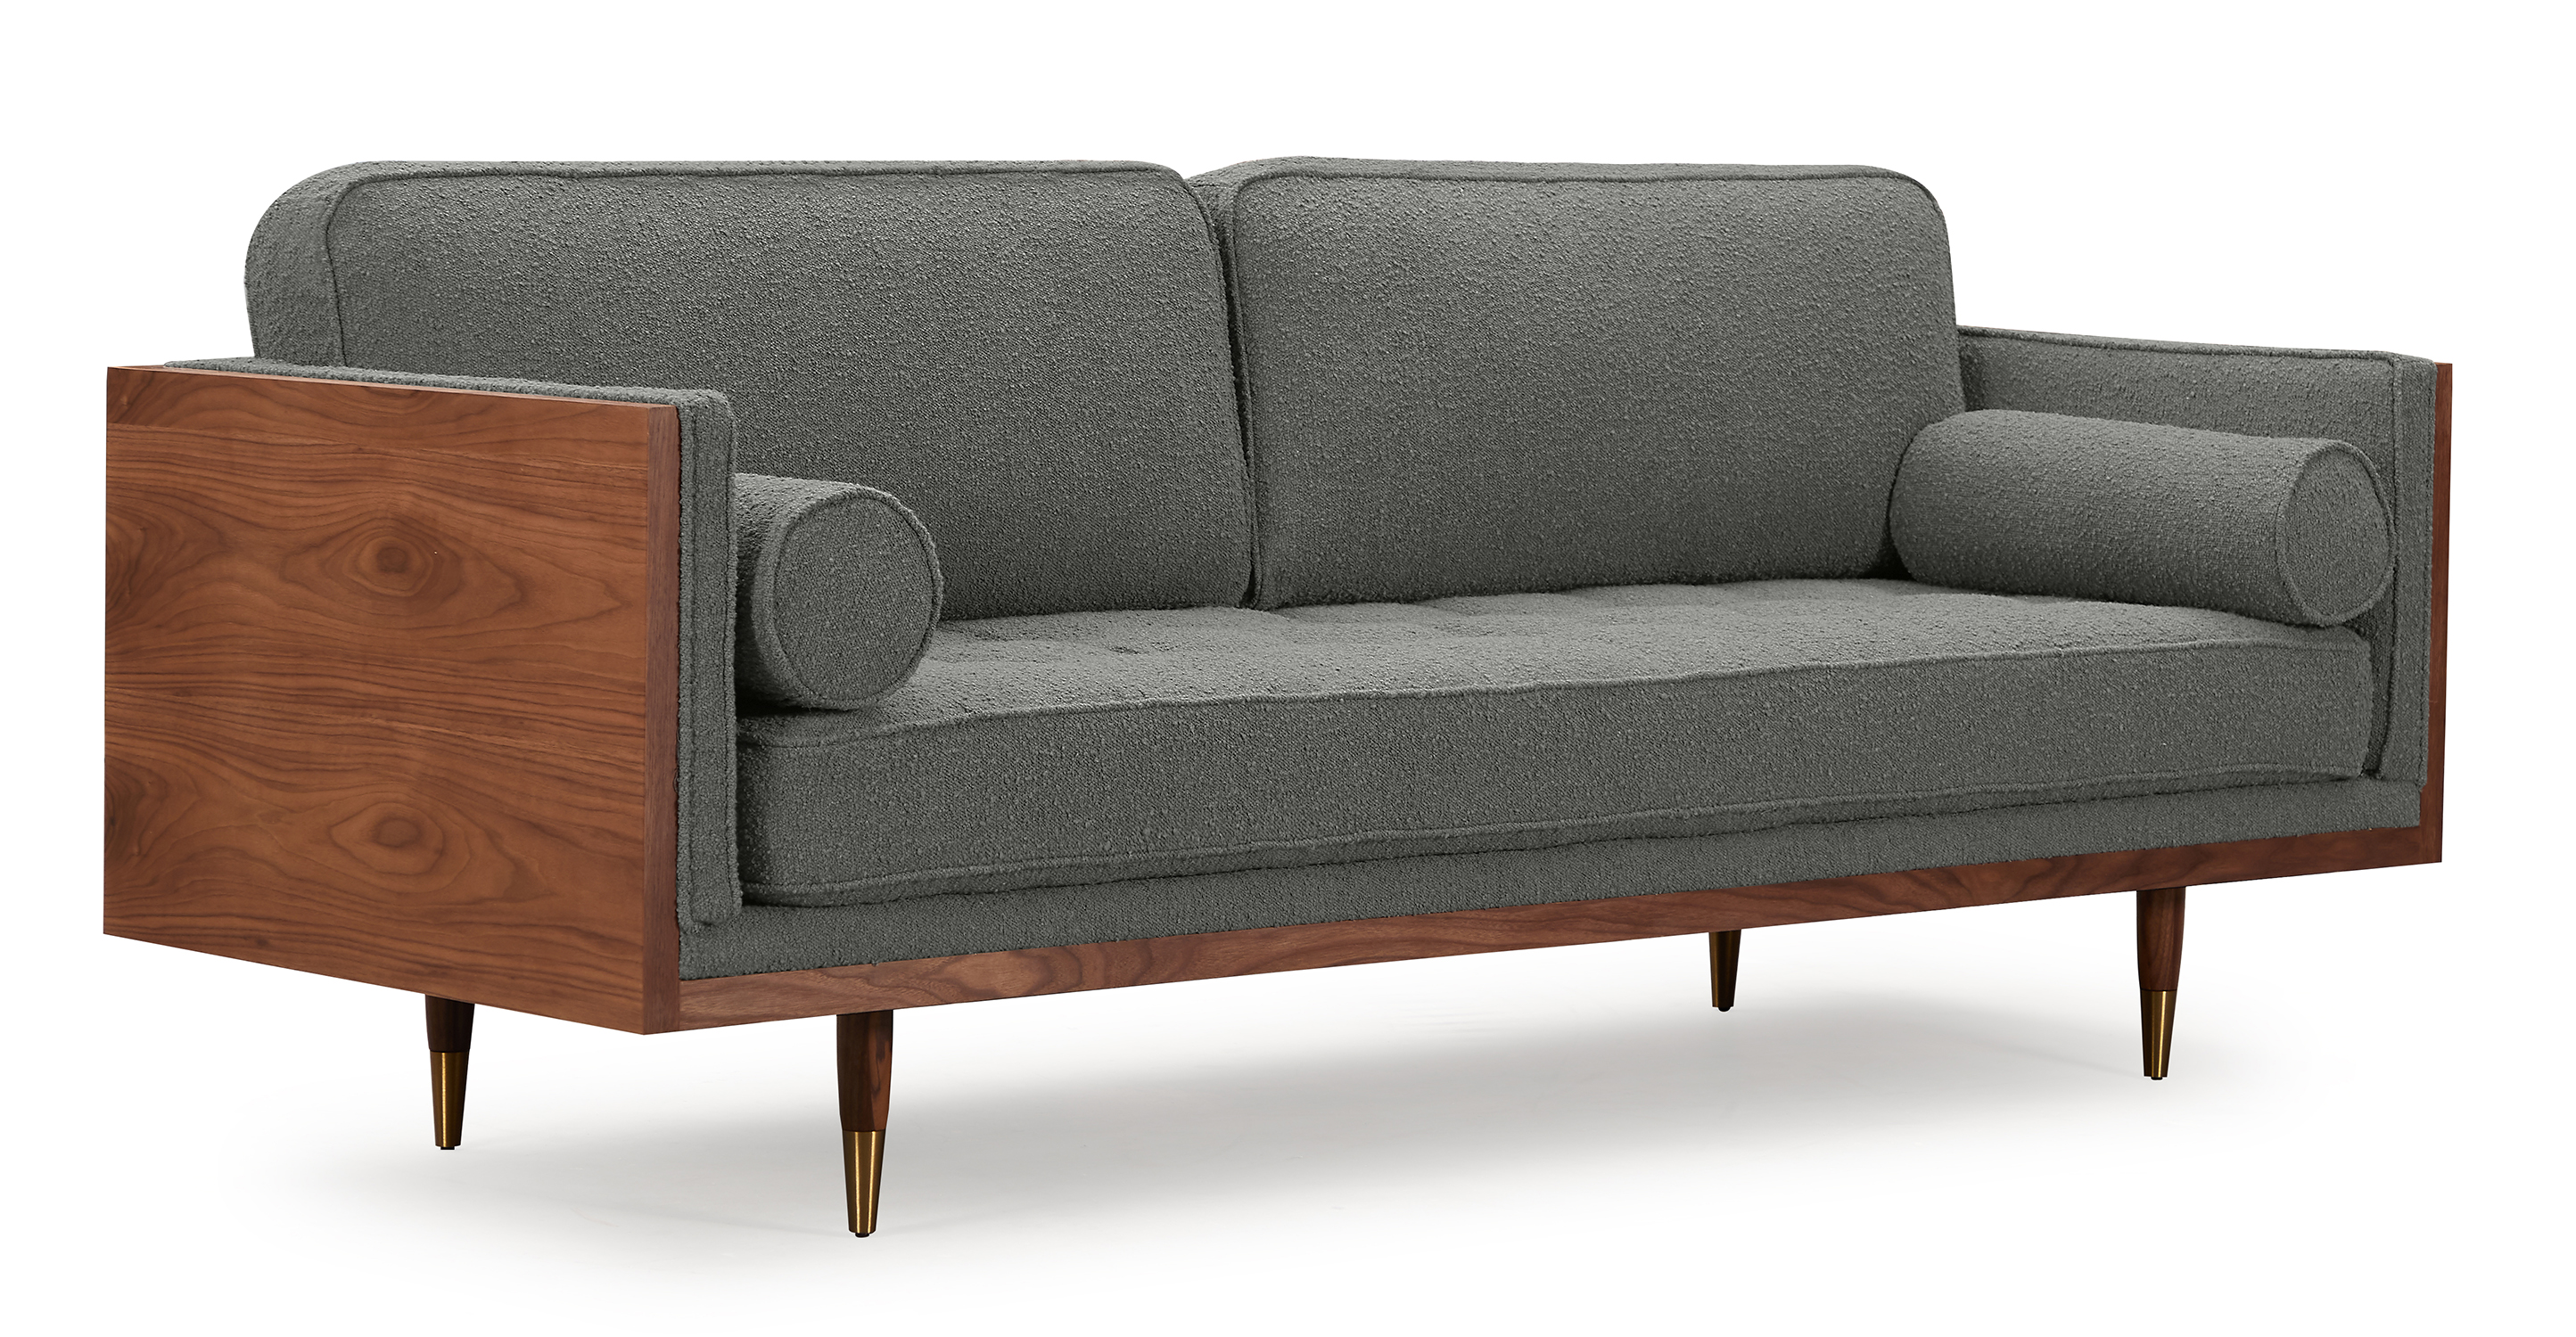 "Woodrow Skandi 87"" Fabric Sofa, Walnut/Gris Boucle"